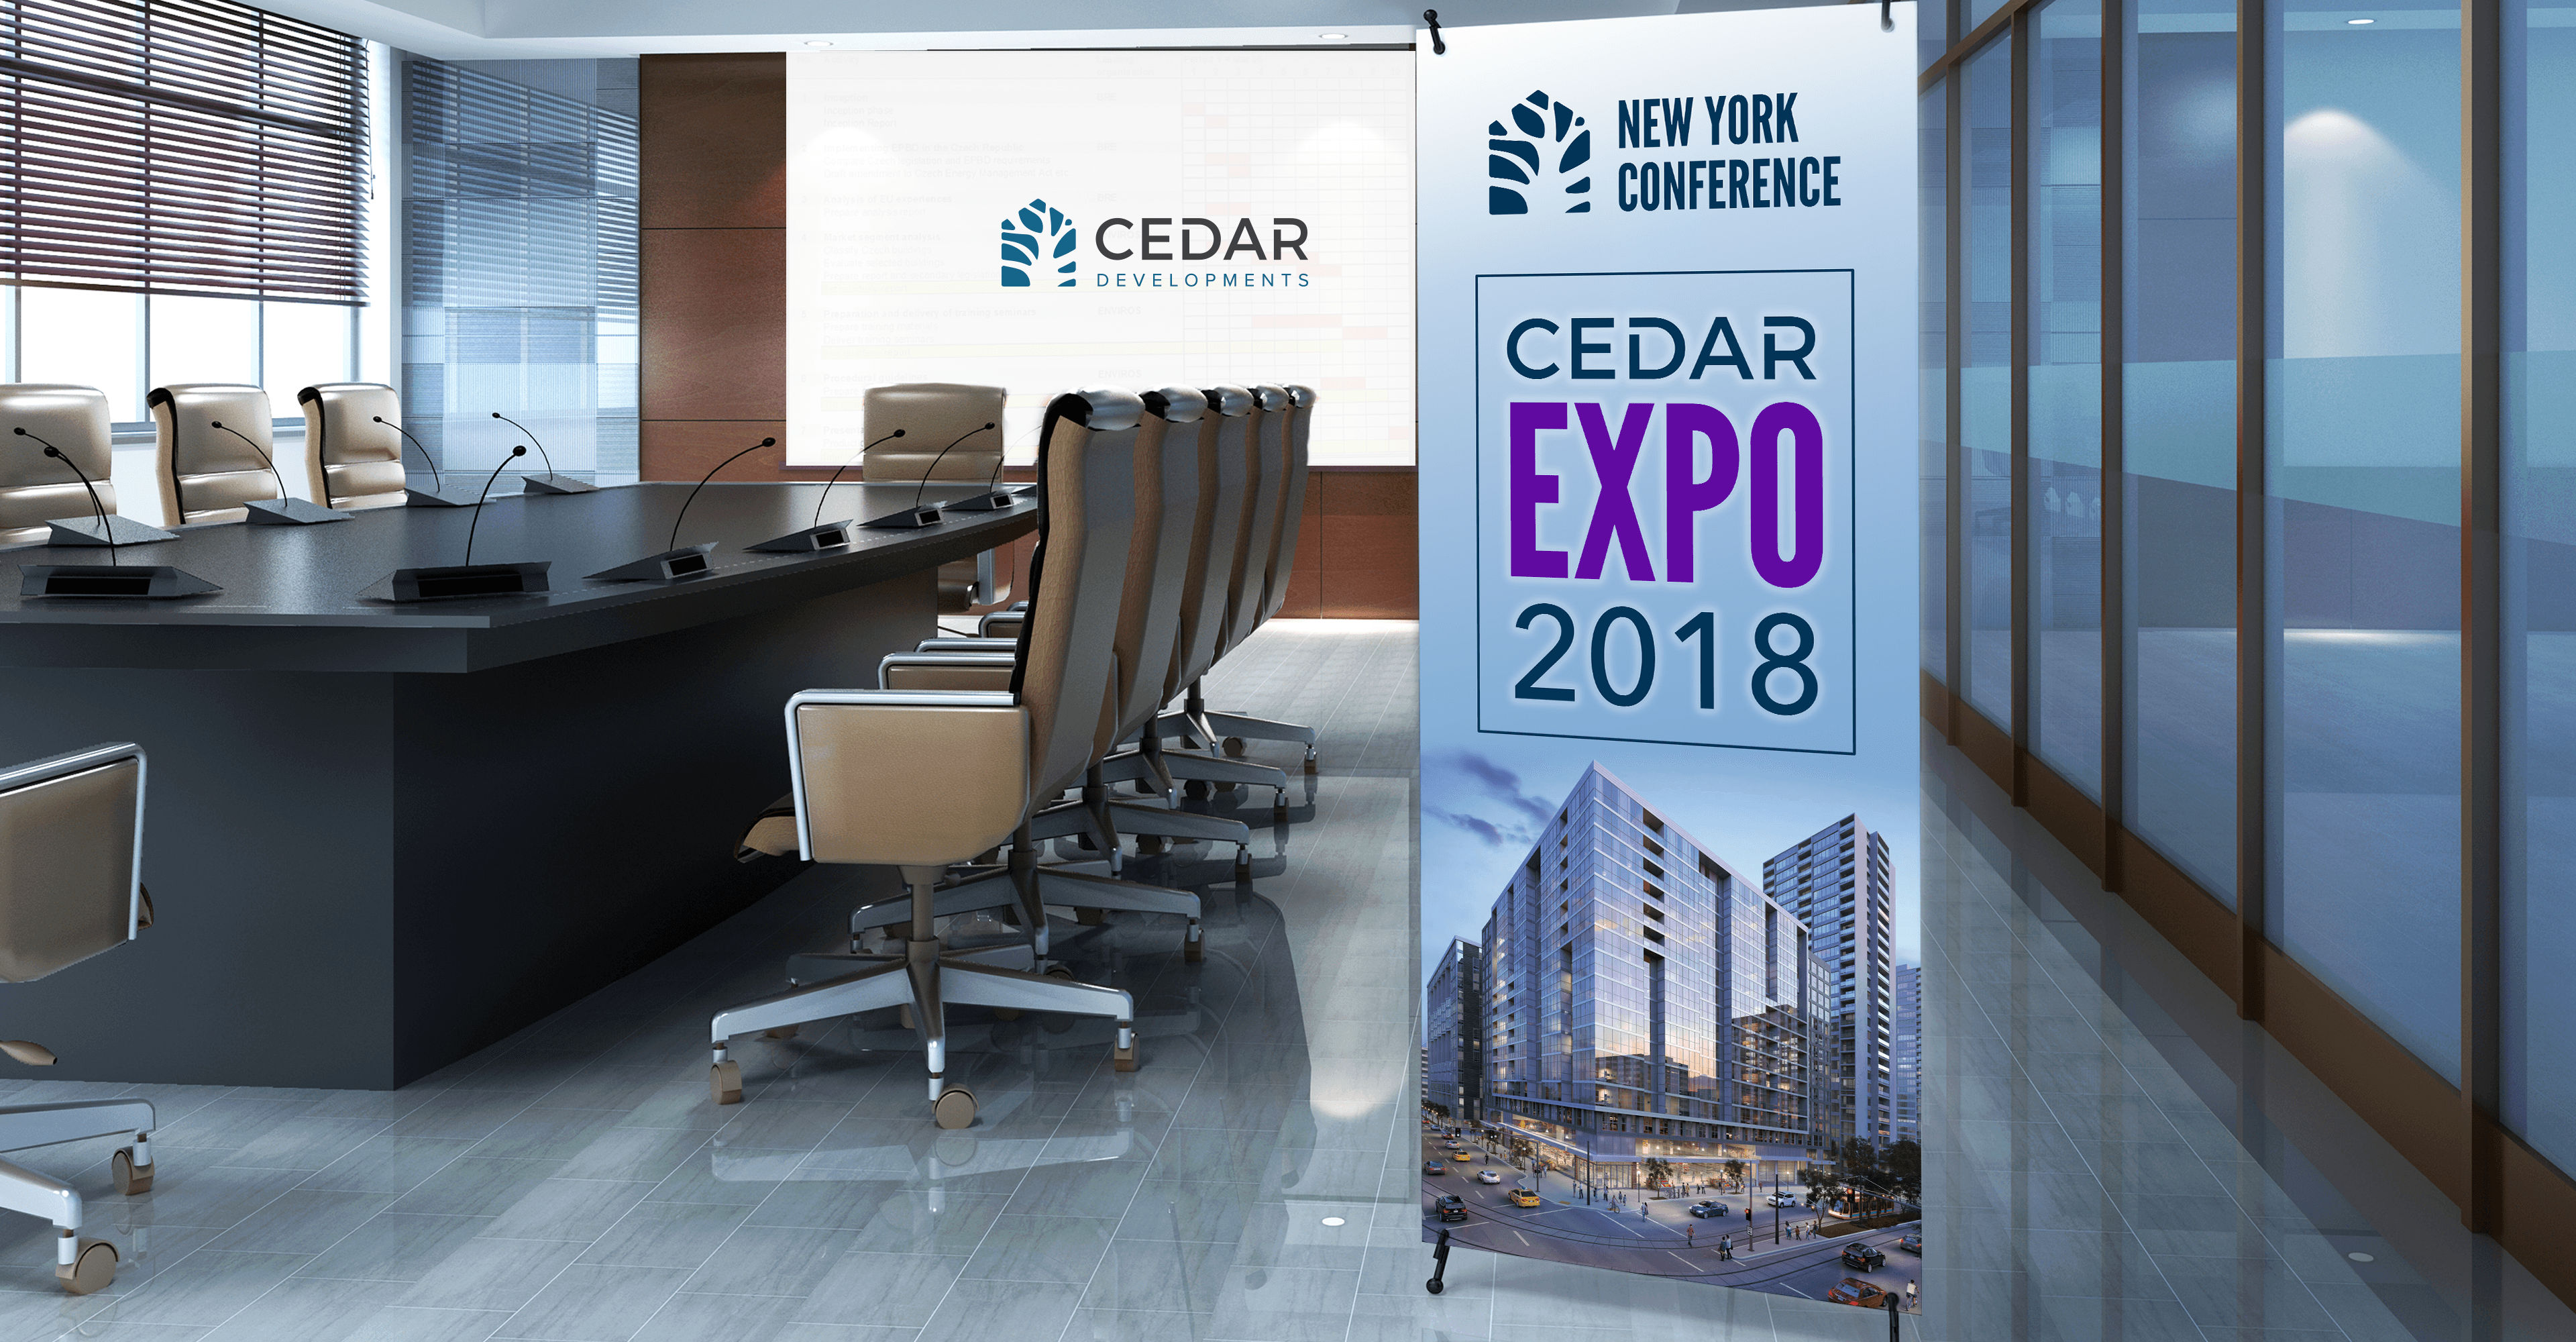 Cedar Developments Expo - iDesign Branding